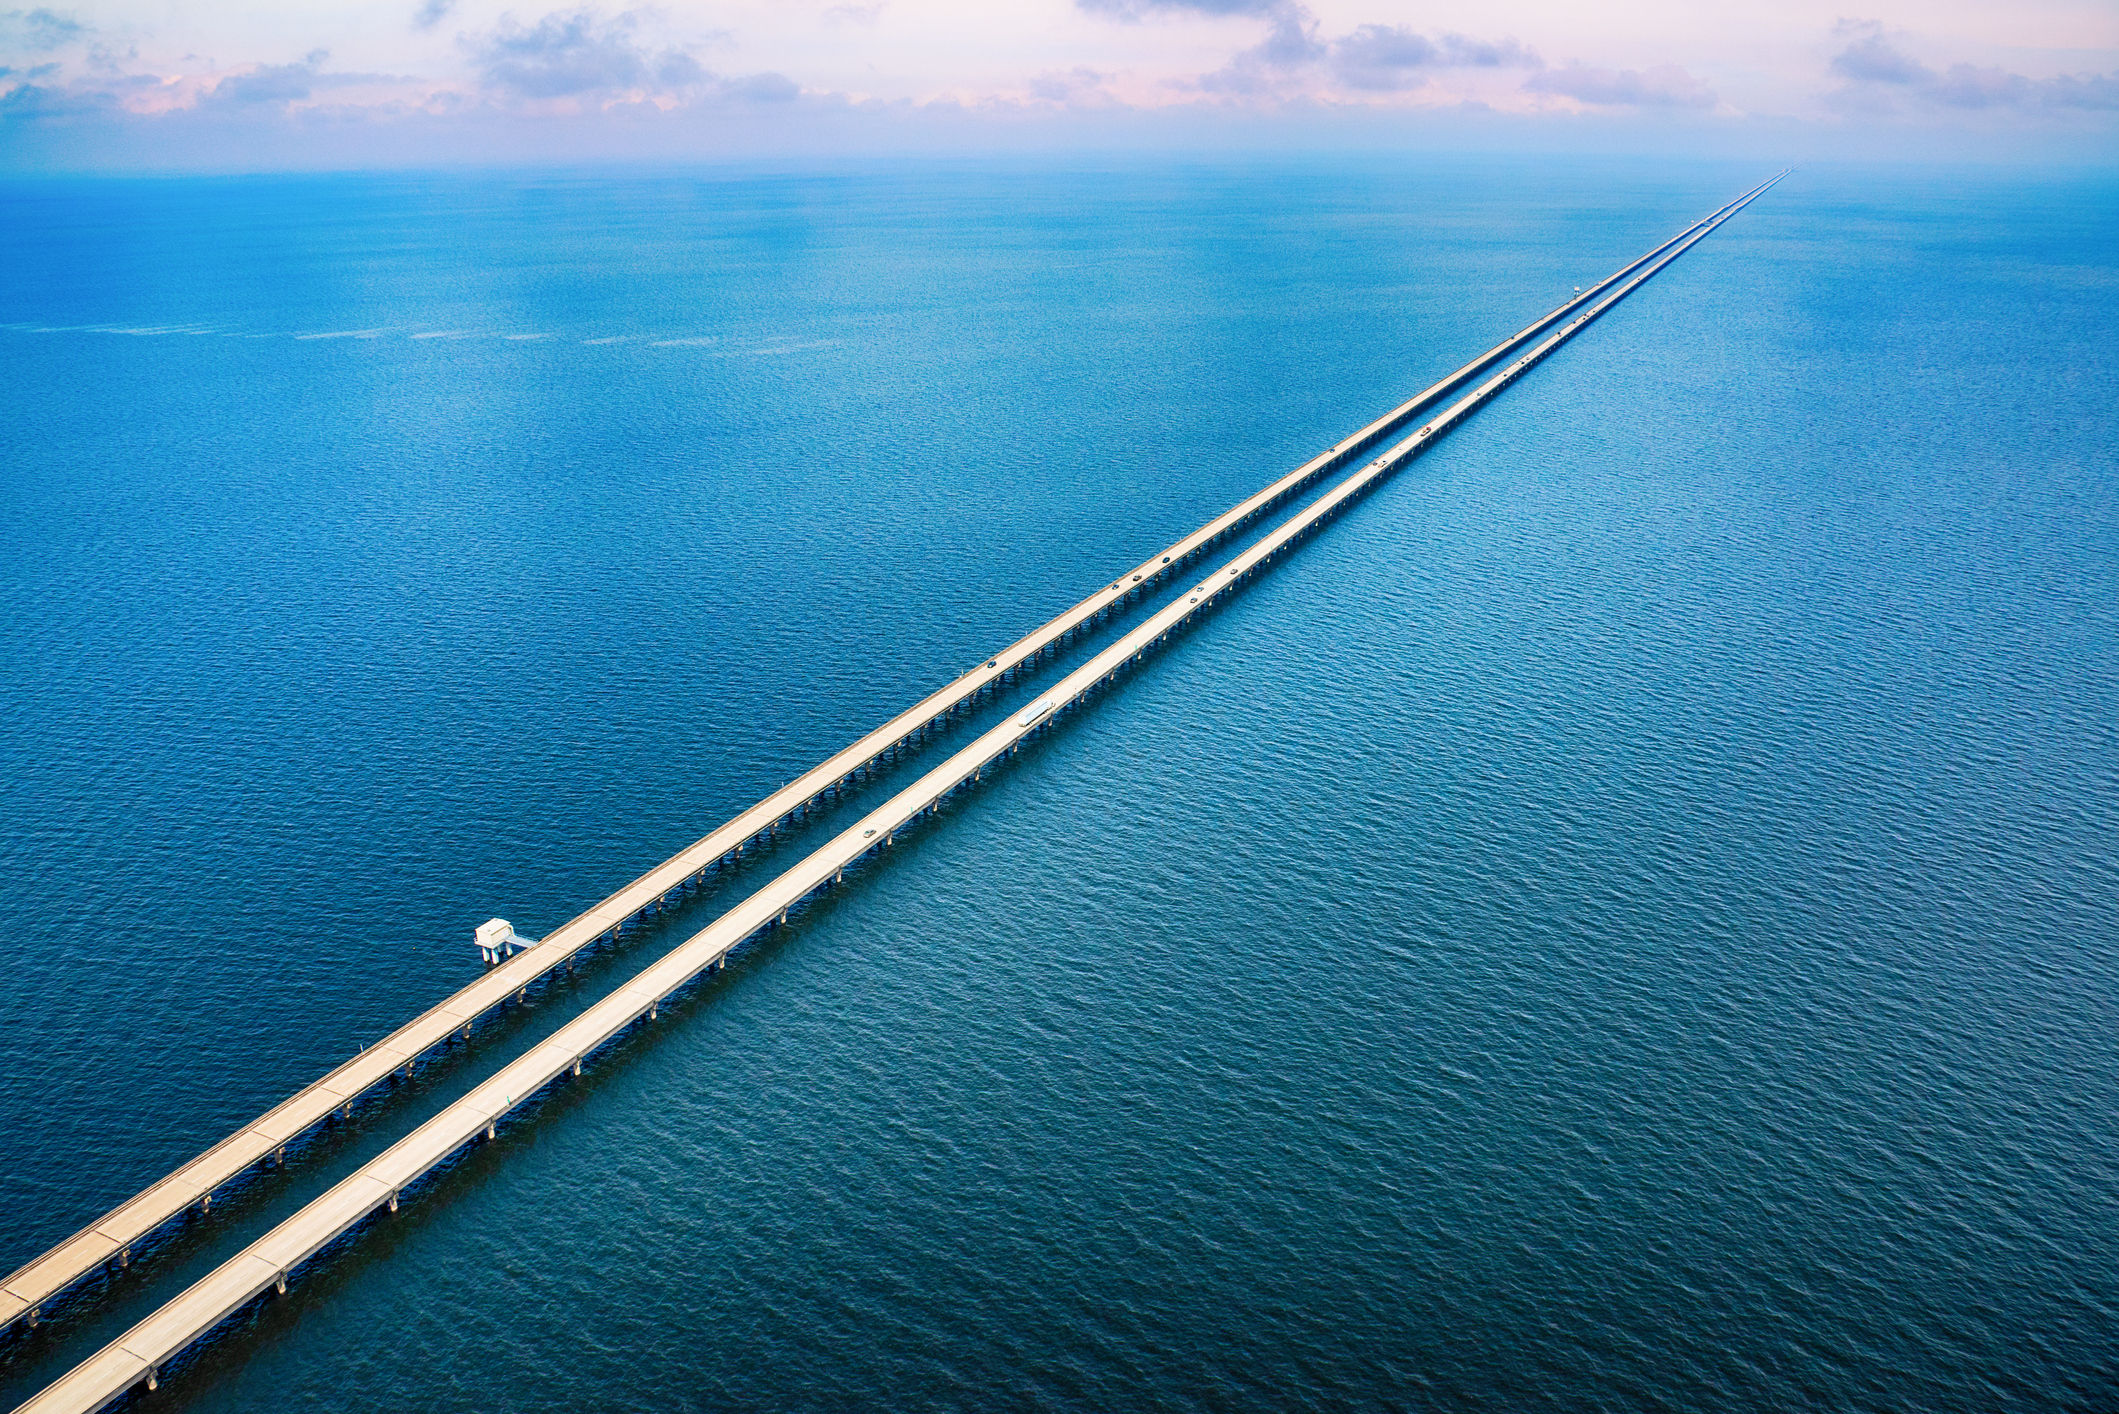 08 - Puente calzada del lago Pontchartrain-EEUU_iStock-1048677266_imagen8